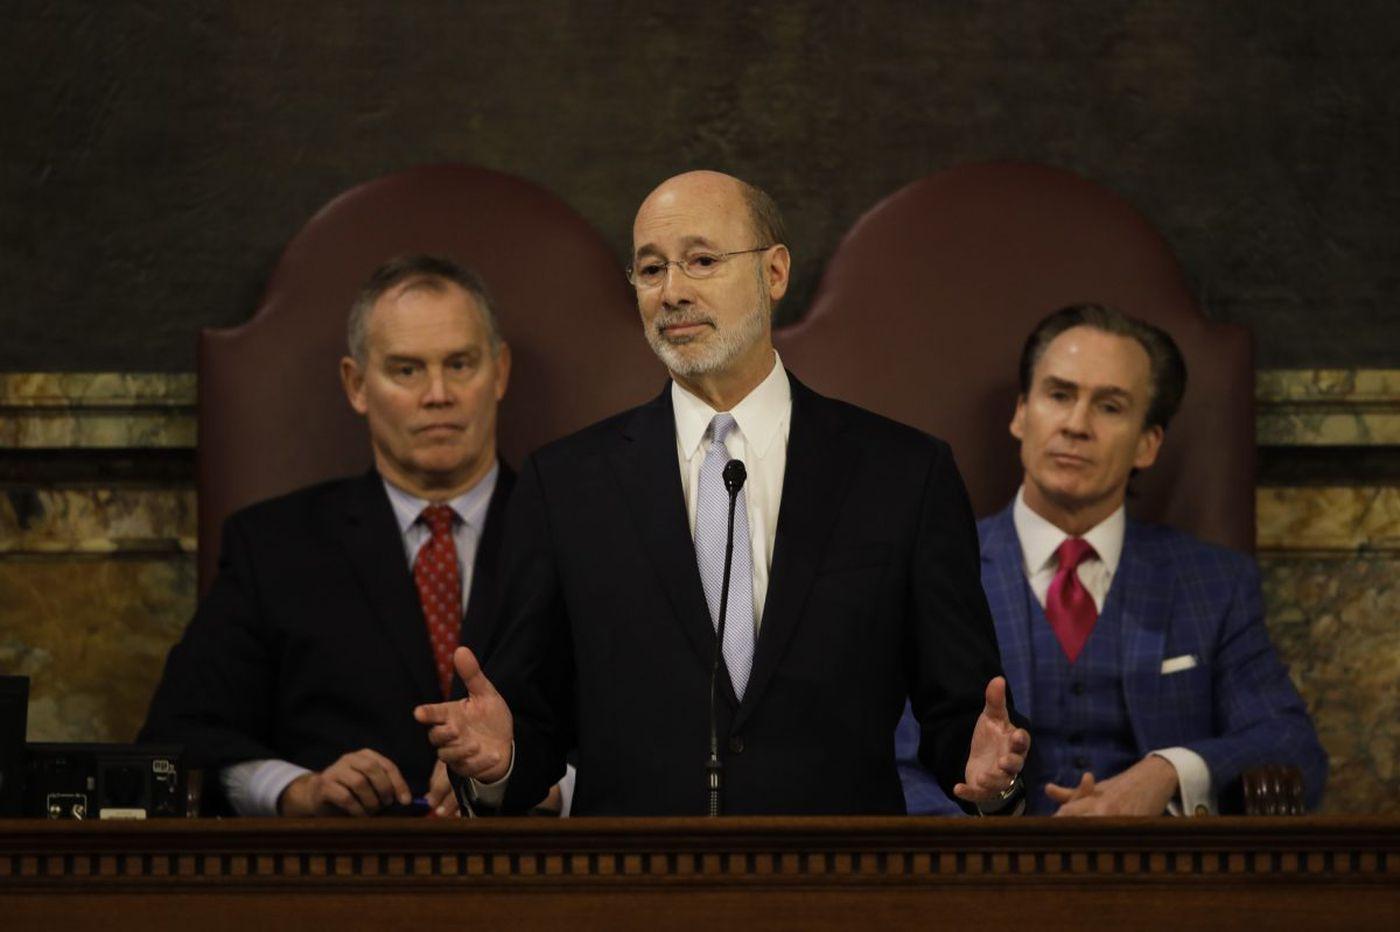 Pa. legislature expands gambling, borrows $1.5 billion to balance budget. Will Gov. Wolf sign?